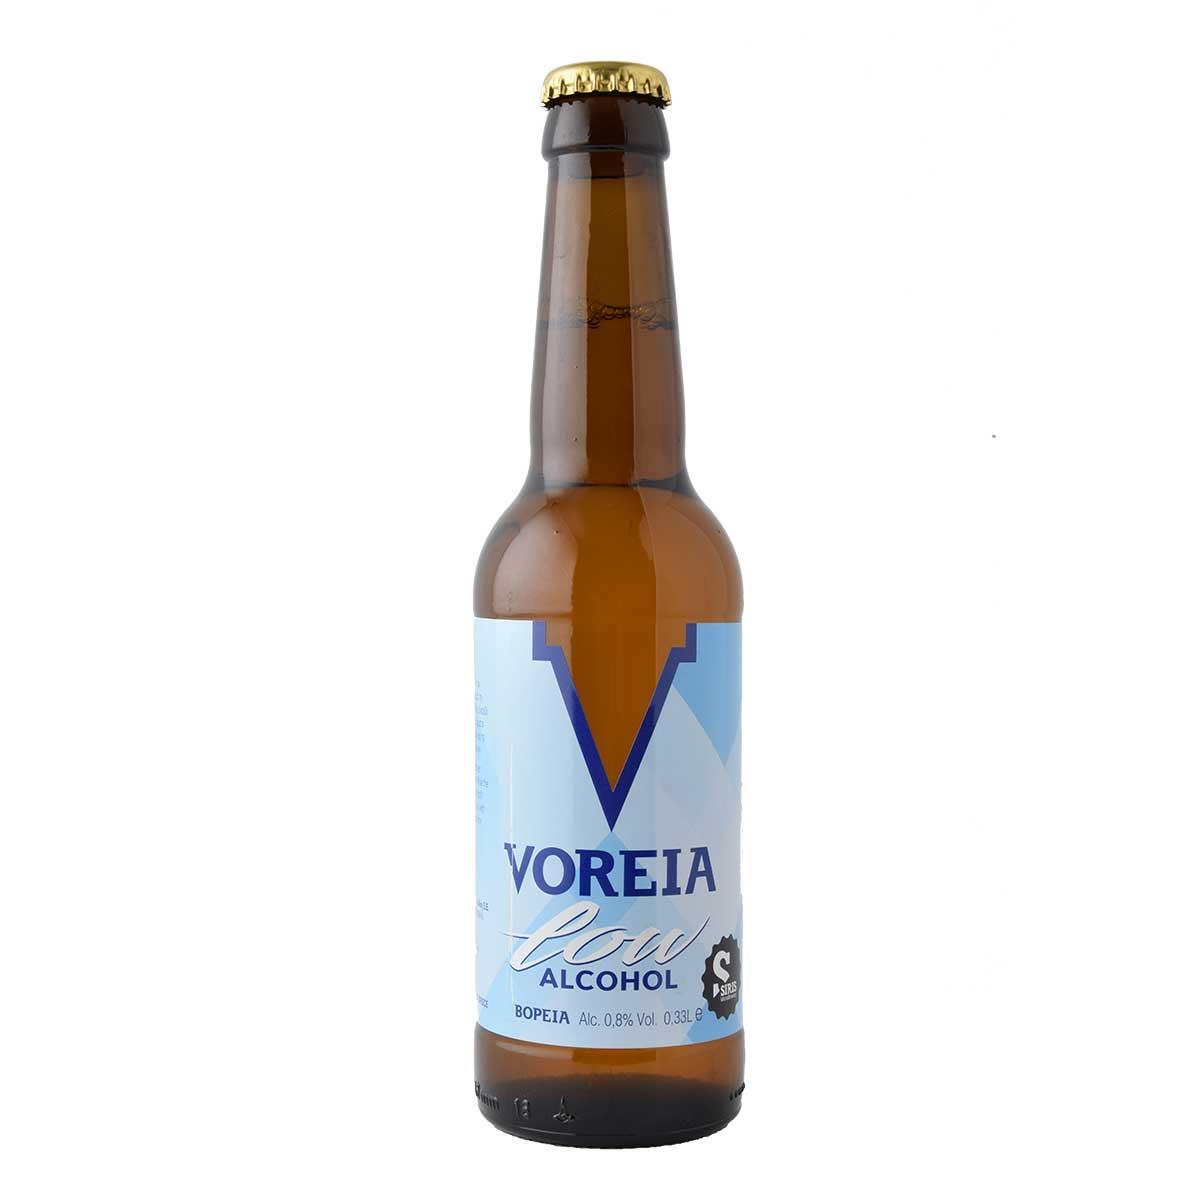 Voreia Low Alcohol 330ml